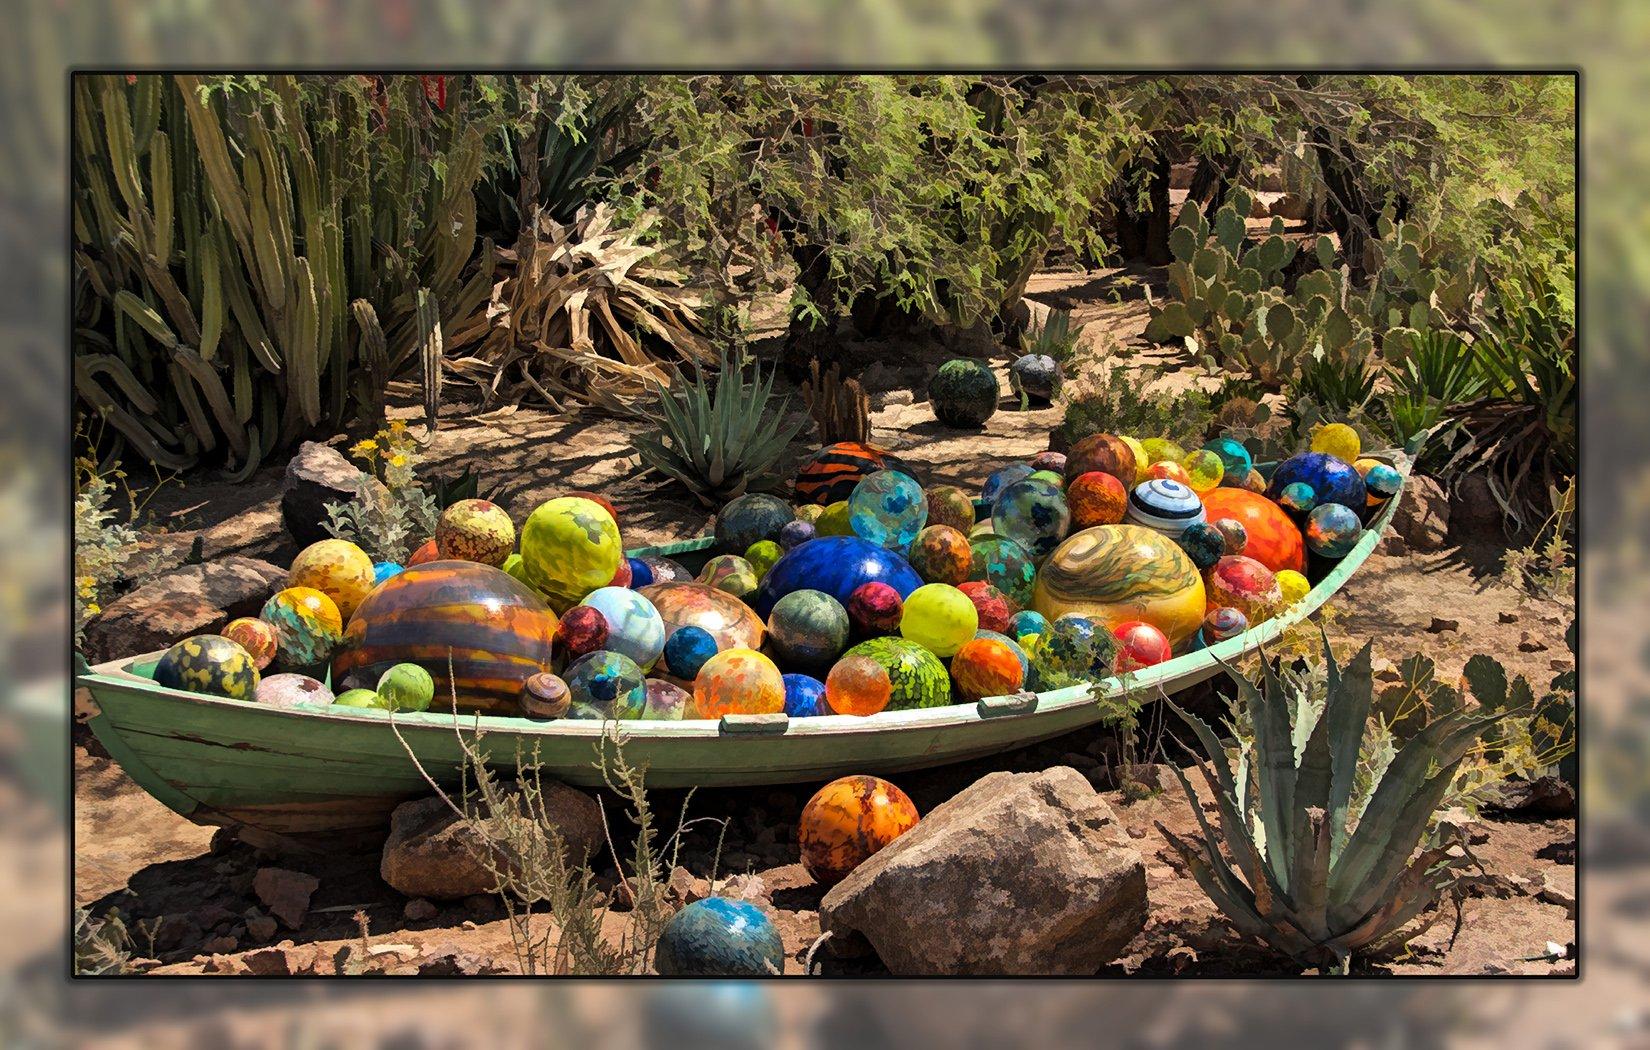 CHIHULY GLASS BALLS-BOTANNICAL GARDENS PANEL by Nancy Fuller